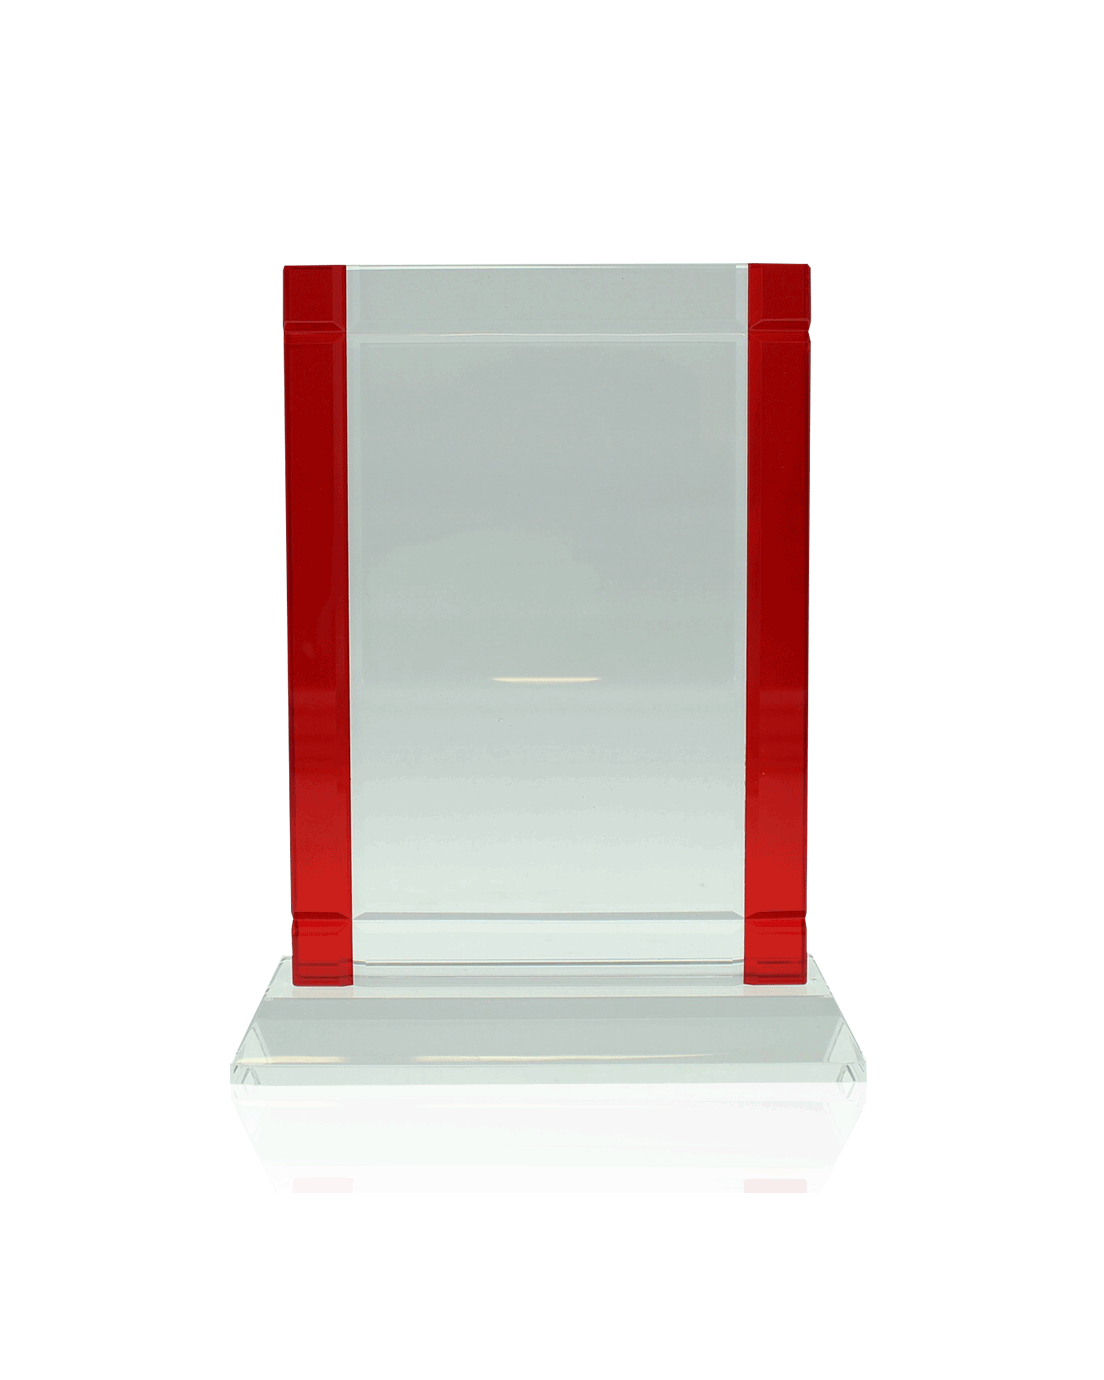 Deco Award Red